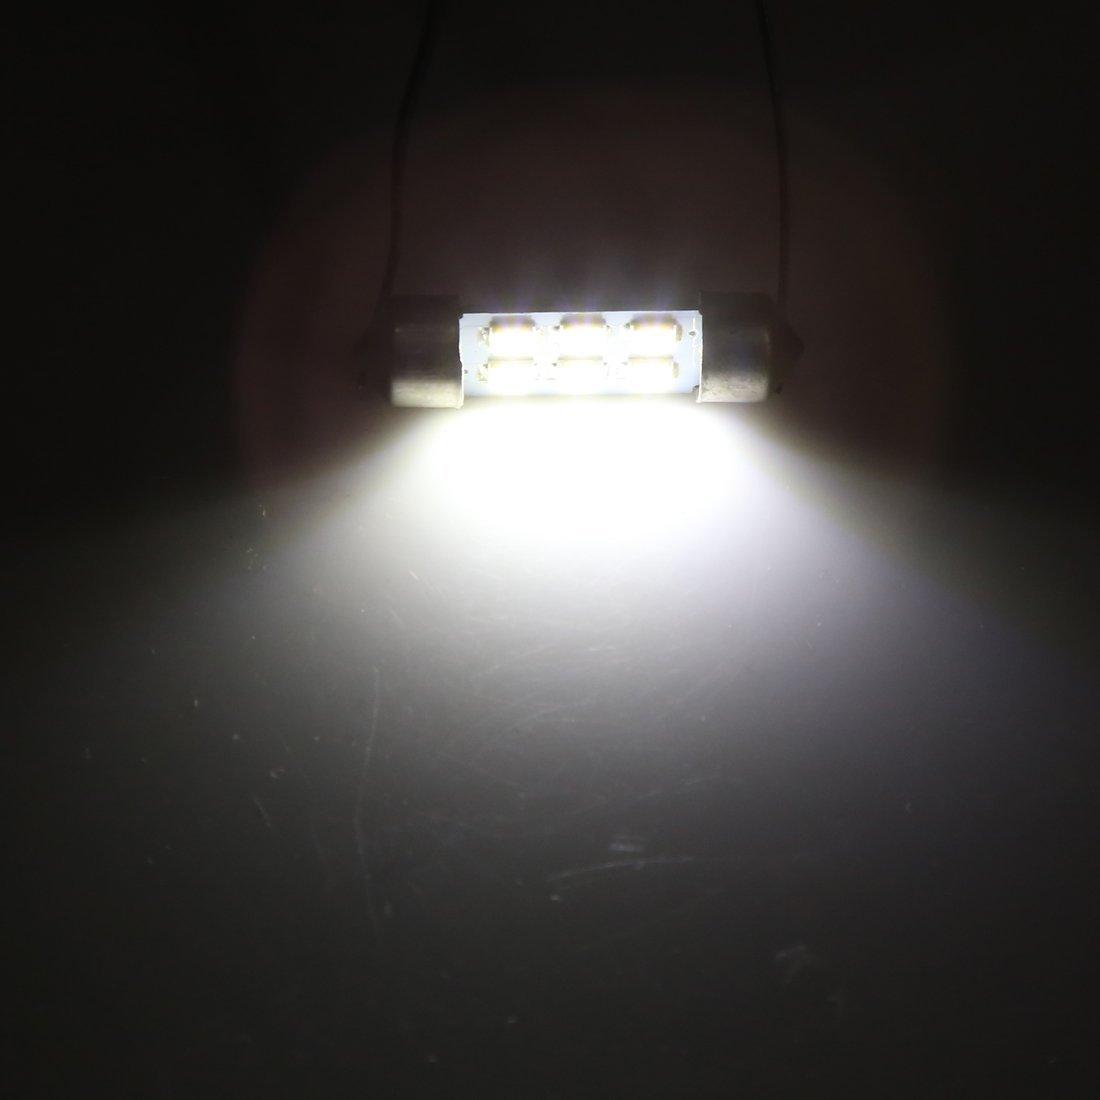 Amazon.com: eDealMax 8pcs 36mm bulbo Blanco Adorno del coche LED SMD 1210 Dome 6 Mapa de luz de lámpara Interior: Automotive